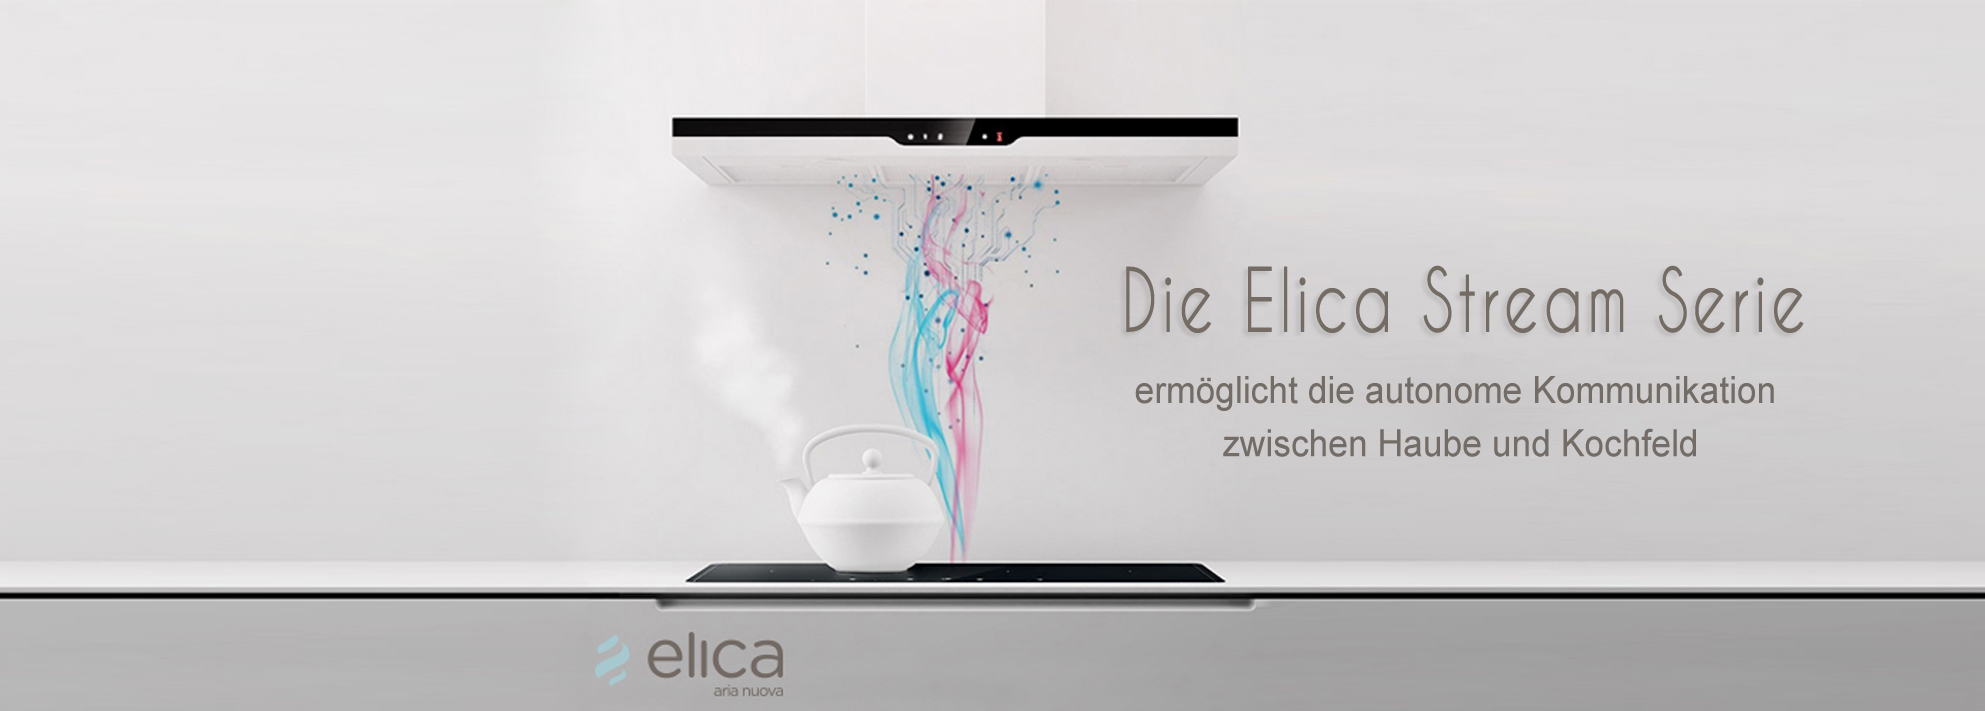 elica-streamKqXy8zuw9GMcC